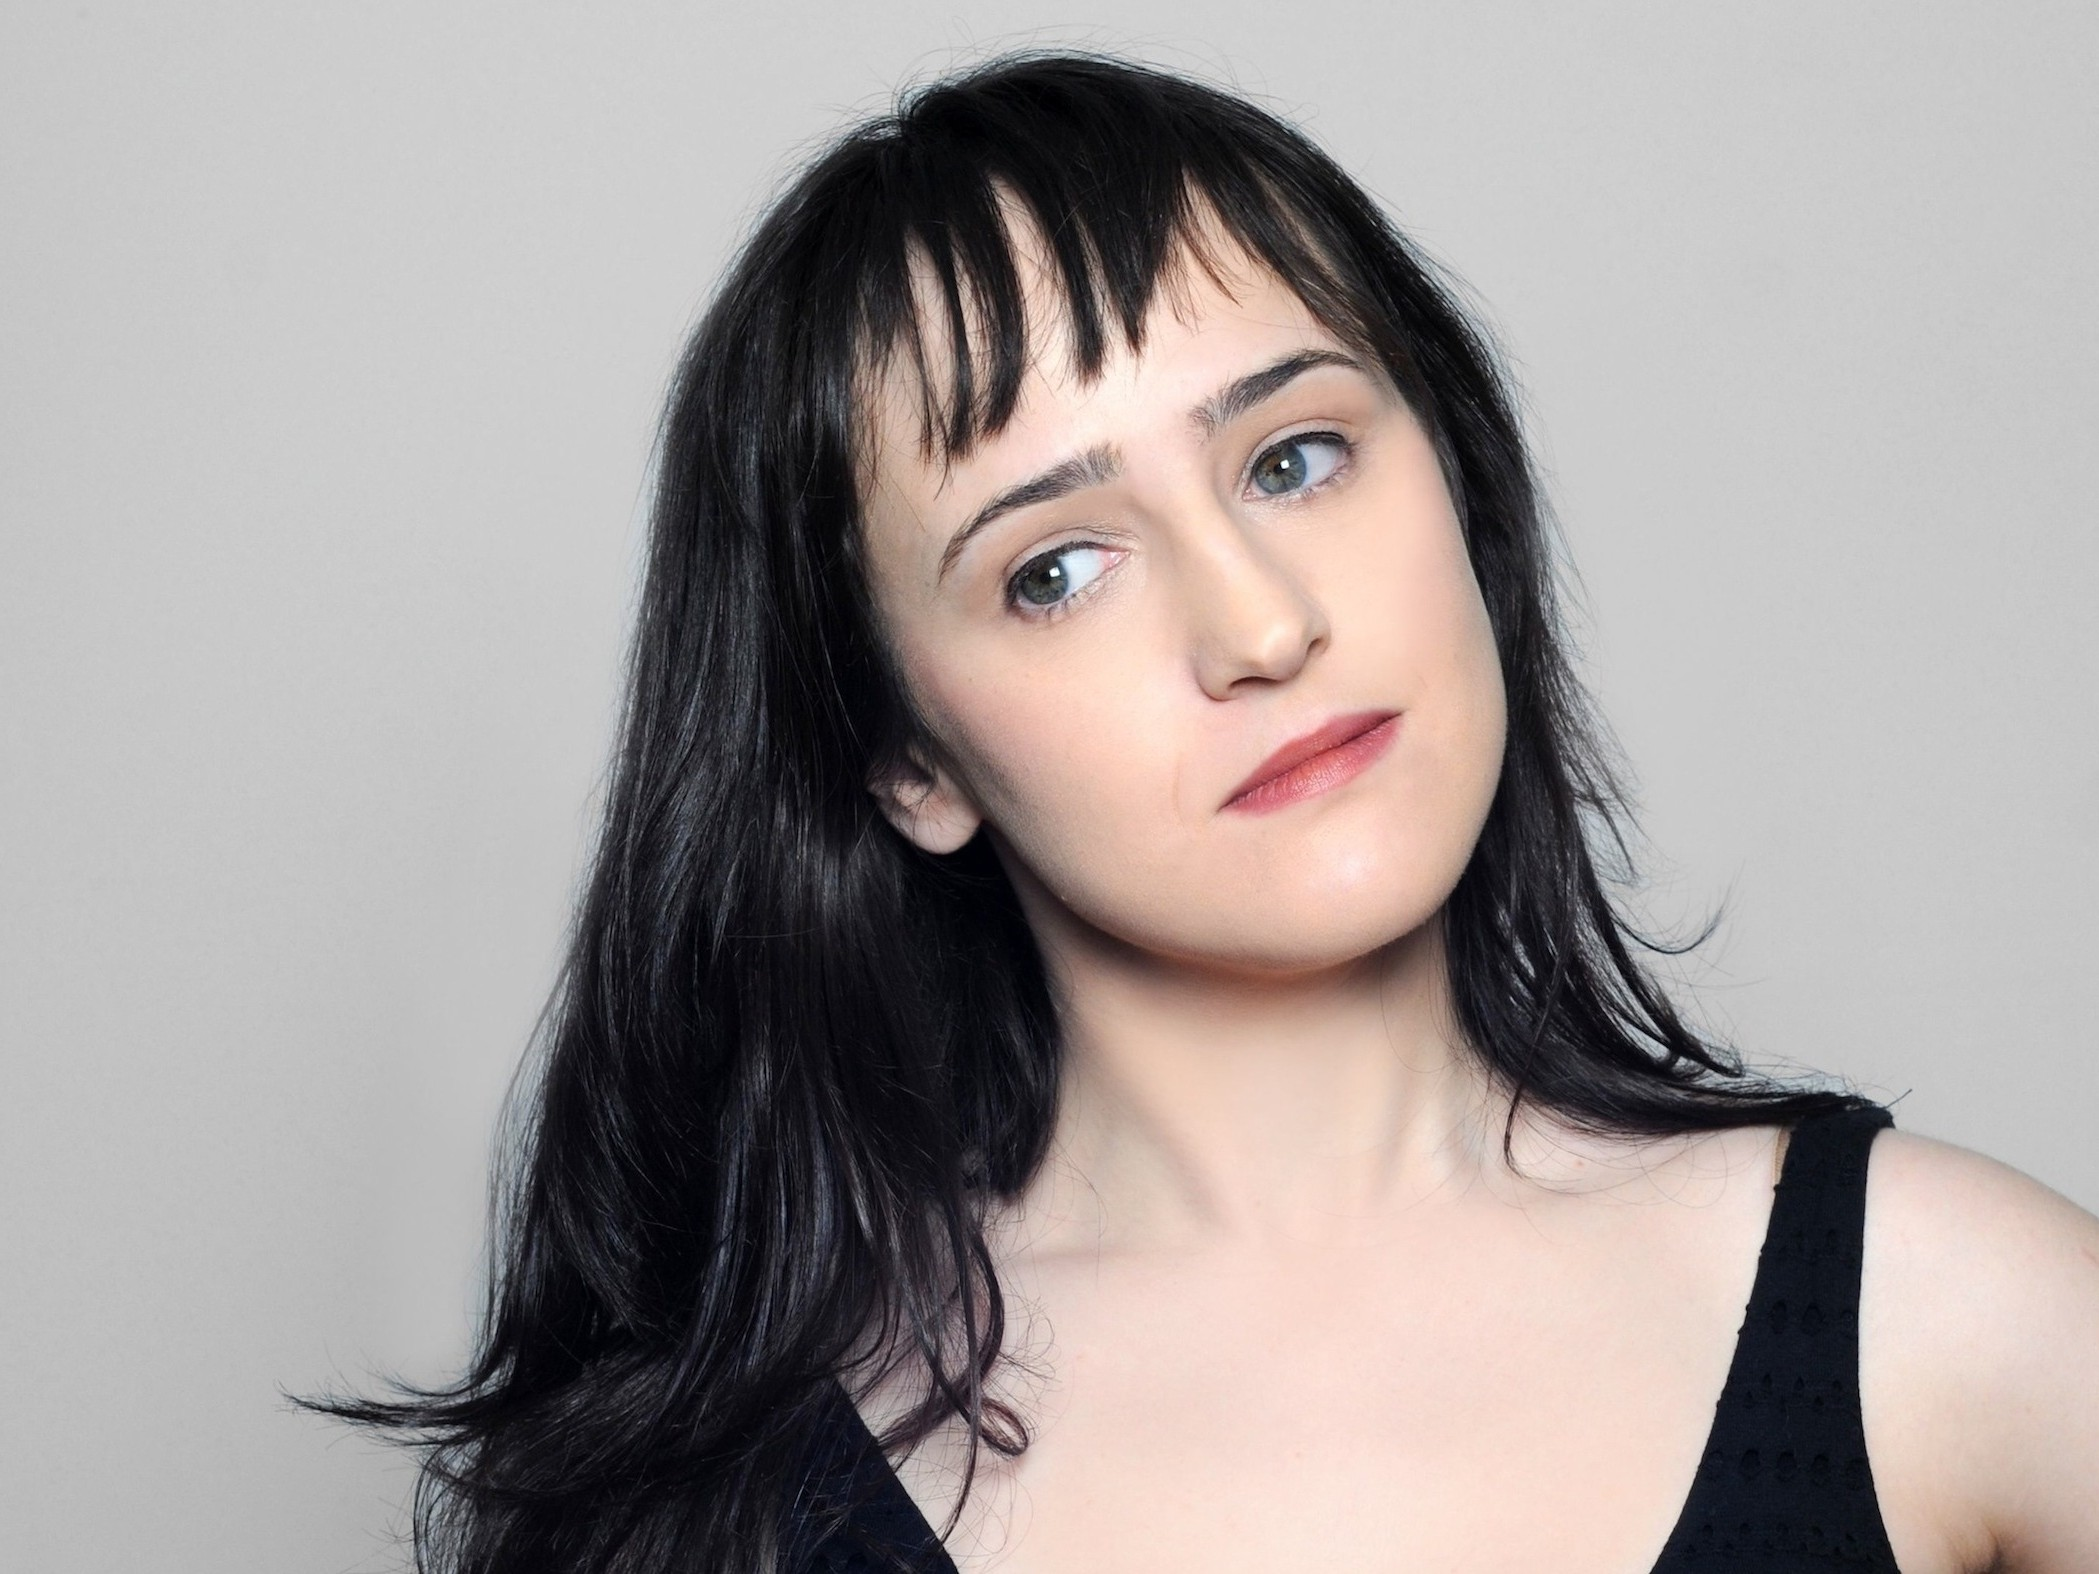 Actress Mara Wilson - age: 34